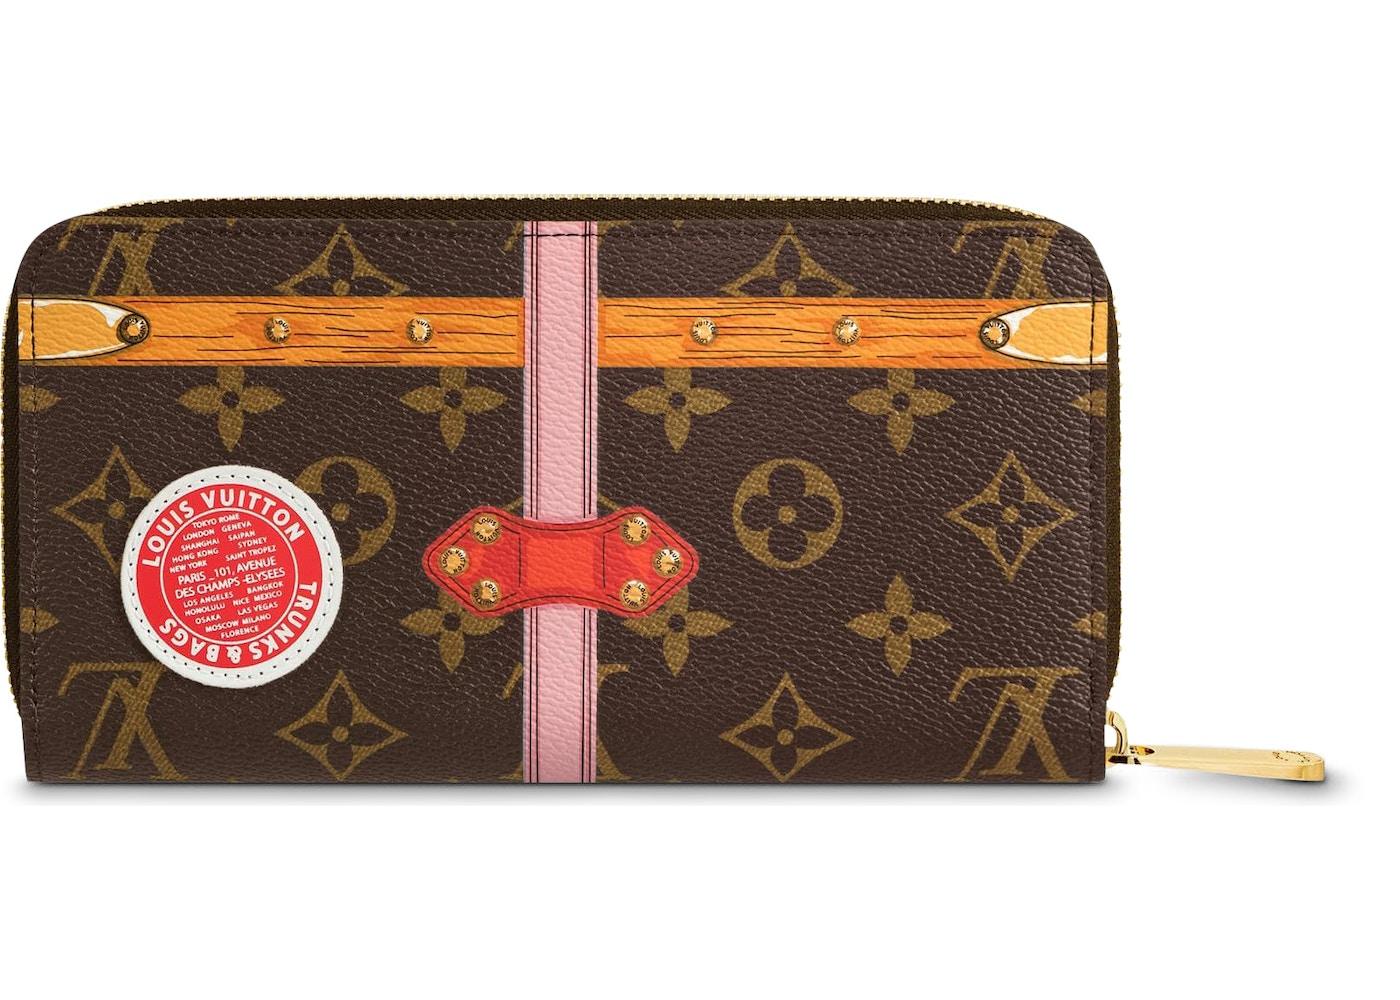 ad5dc902c70 Louis Vuitton Wallet Zippy Monogram Summer Trunk Collection Brown Pink